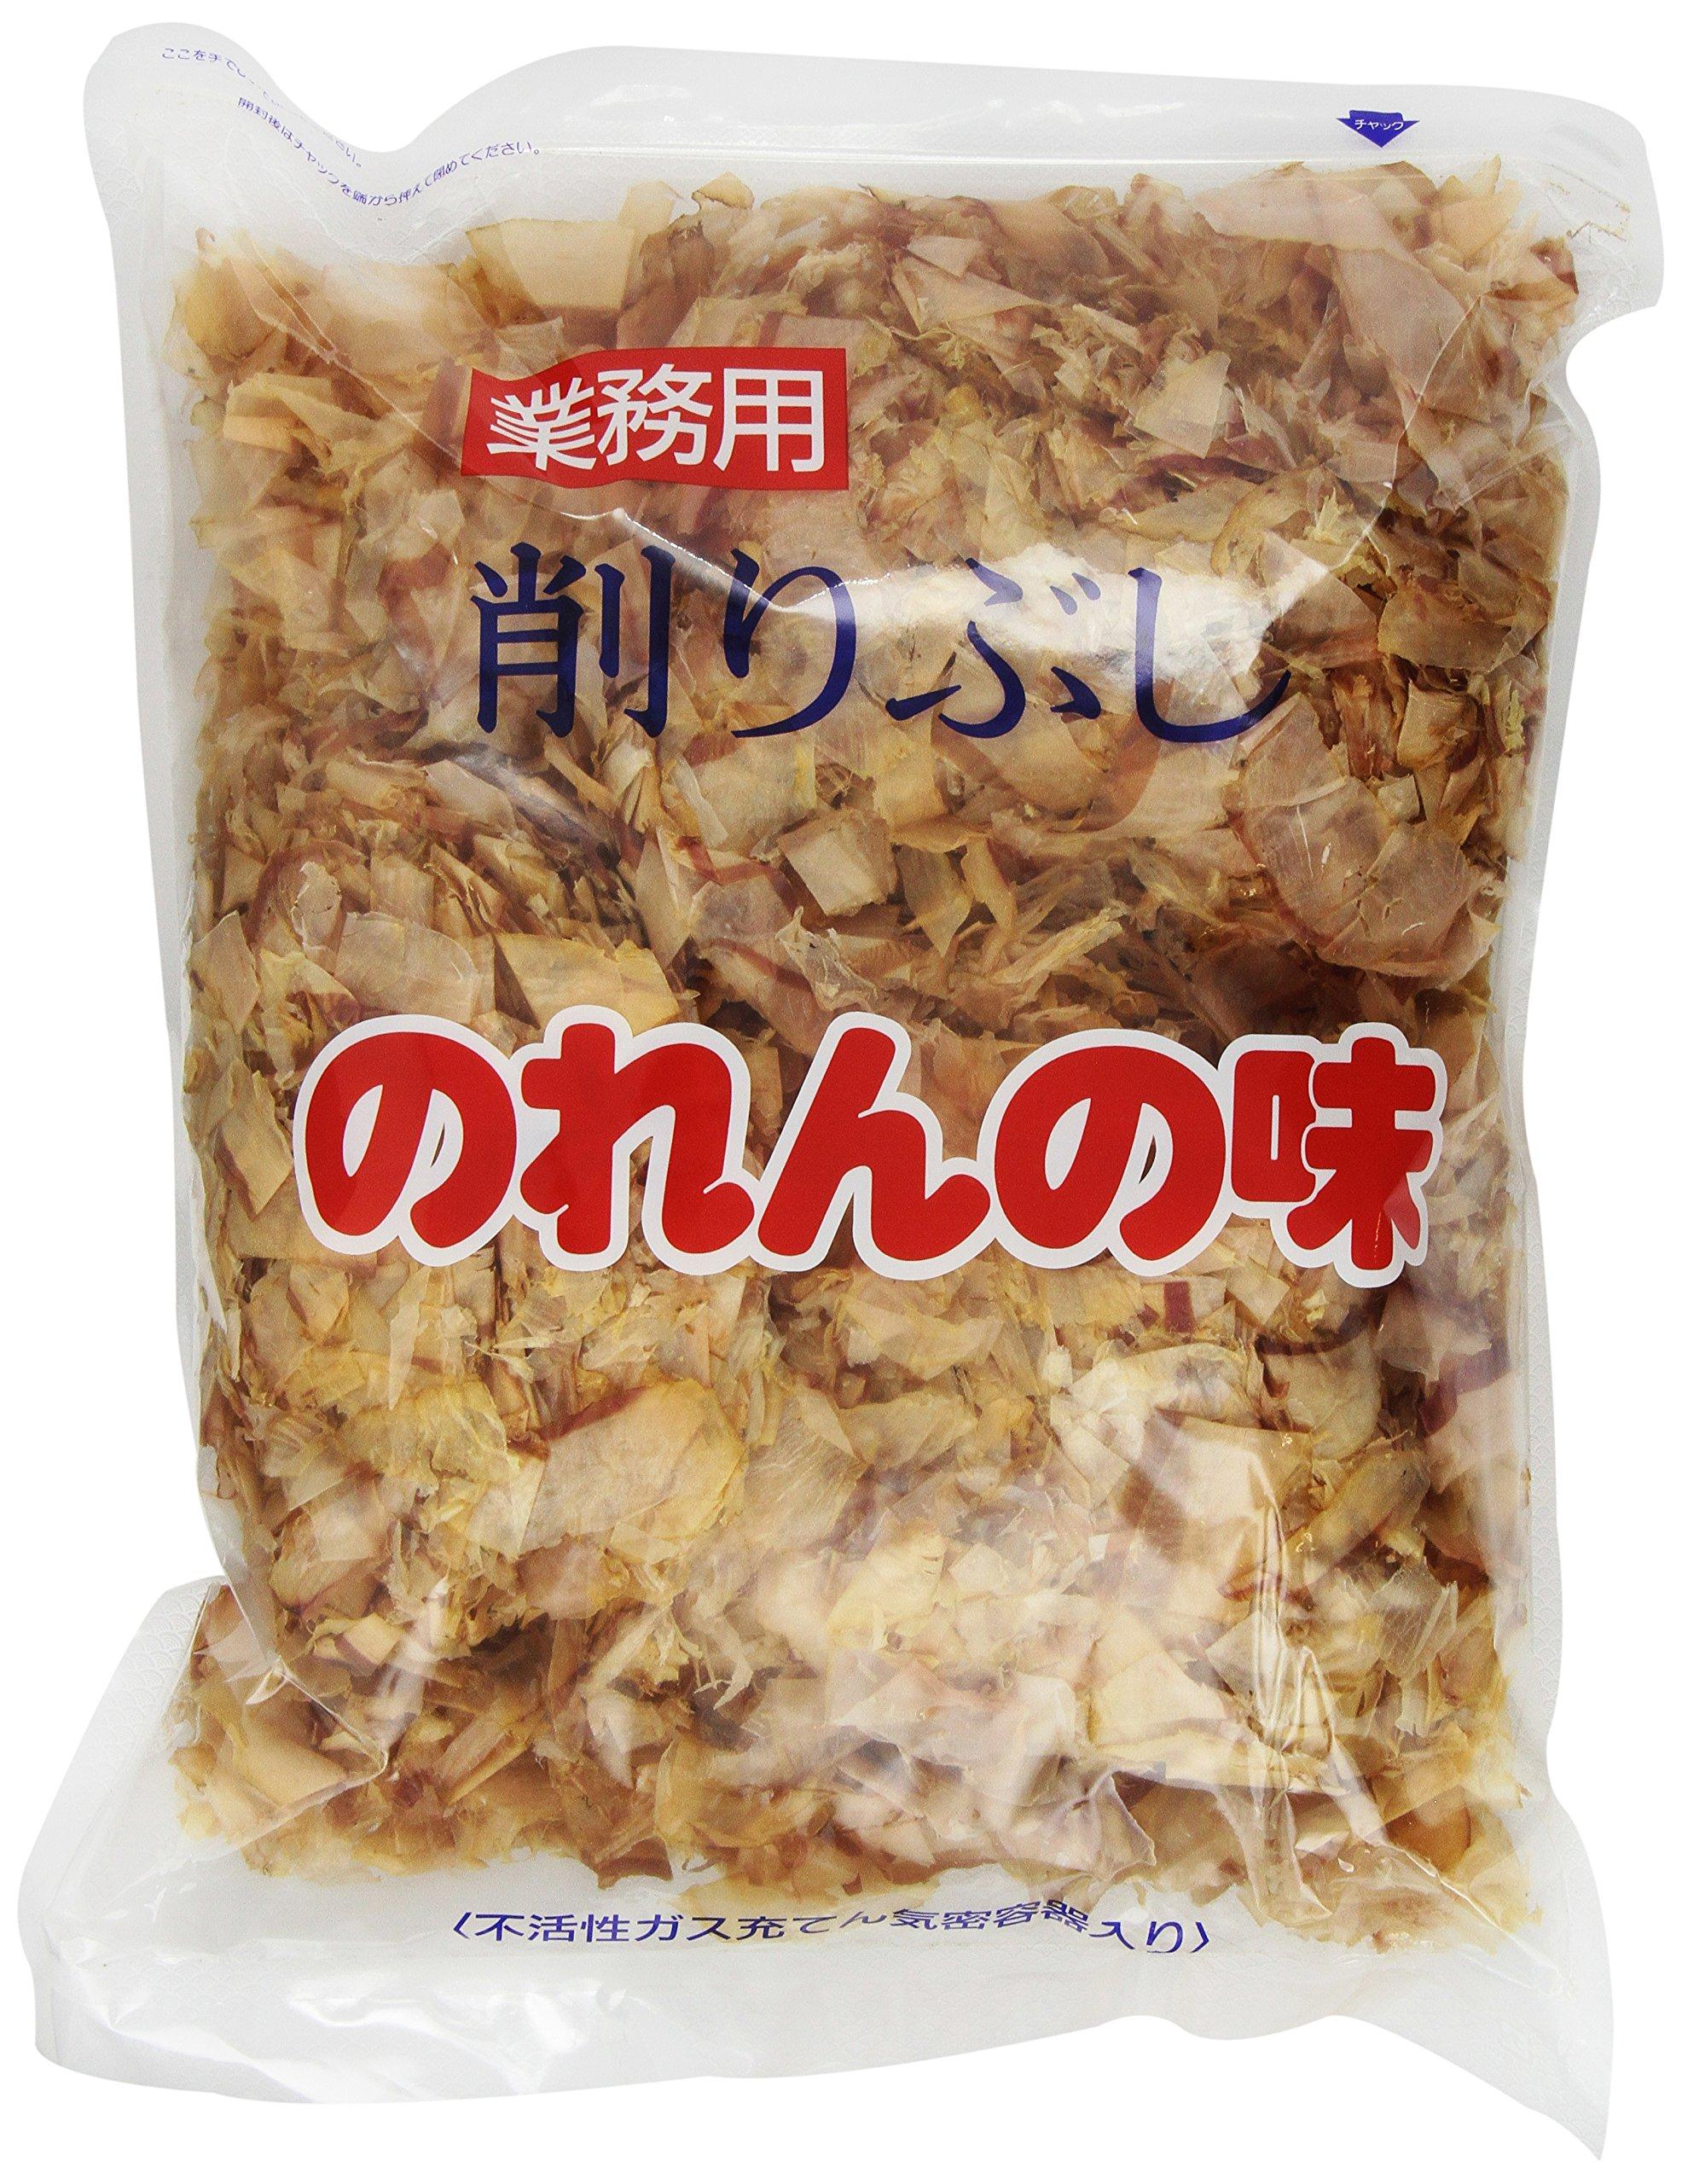 Yamahide Hana Katsuo Bonito Flakes, 1 Pound by Yamahide (Image #1)